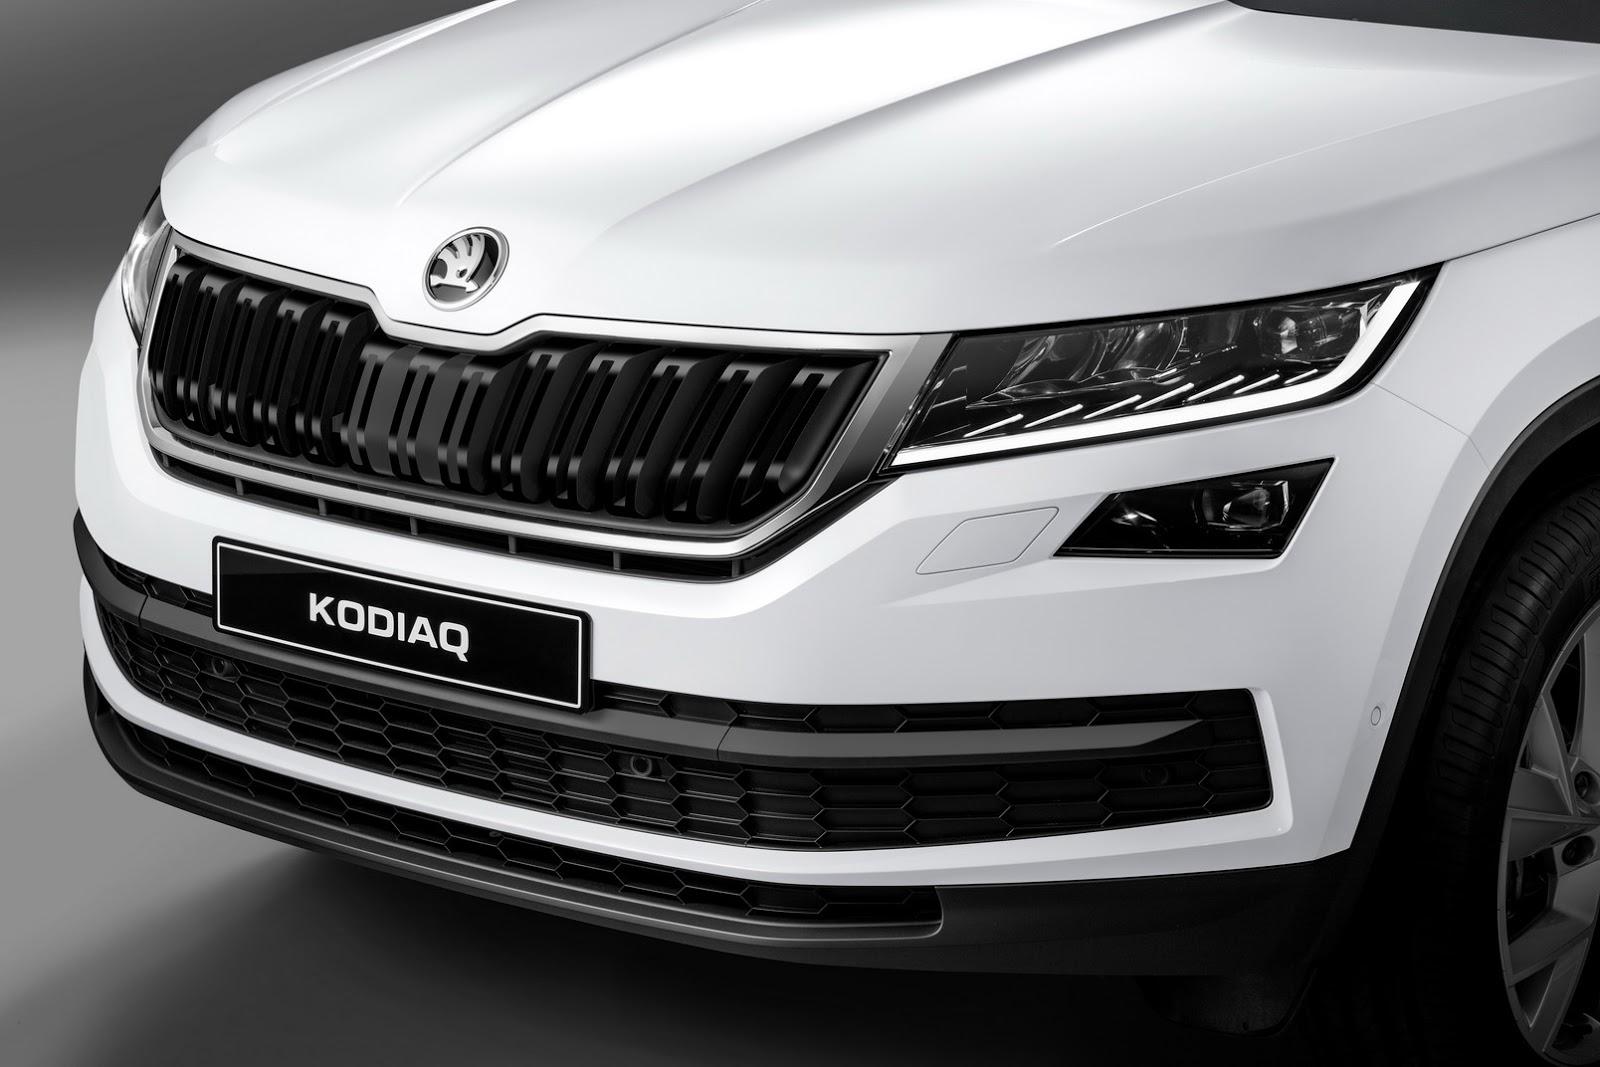 Black Kodiaq >> All-New Skoda Kodiaq 7-Seat SUV Comes With a Choice of 5 ...